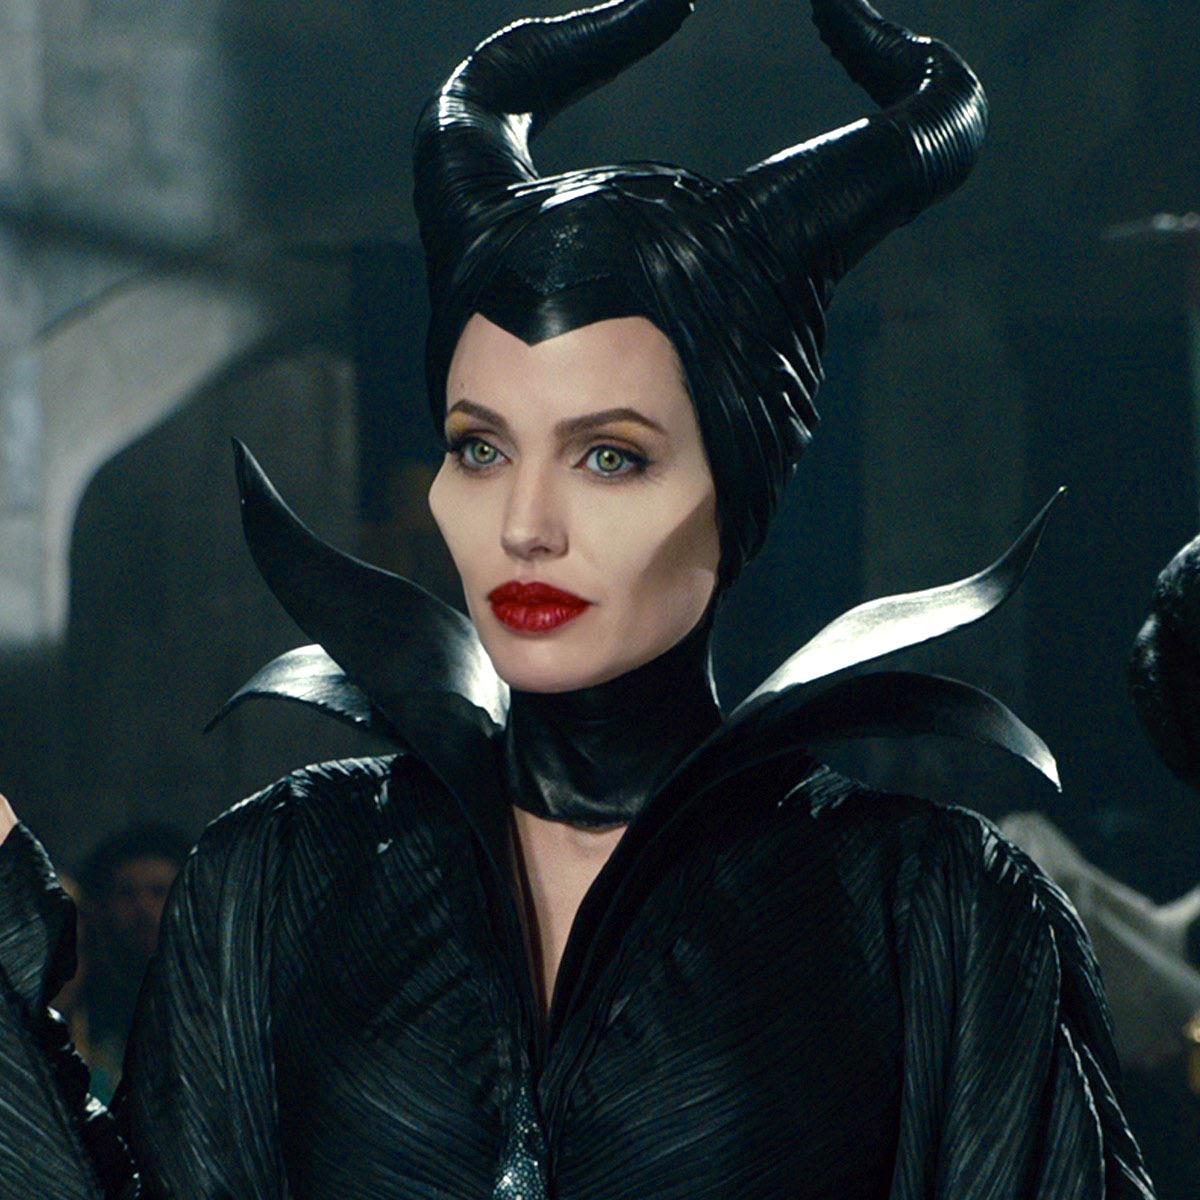 Maleficent Movie Makeup - Angelina Jolie | Sara du Jour